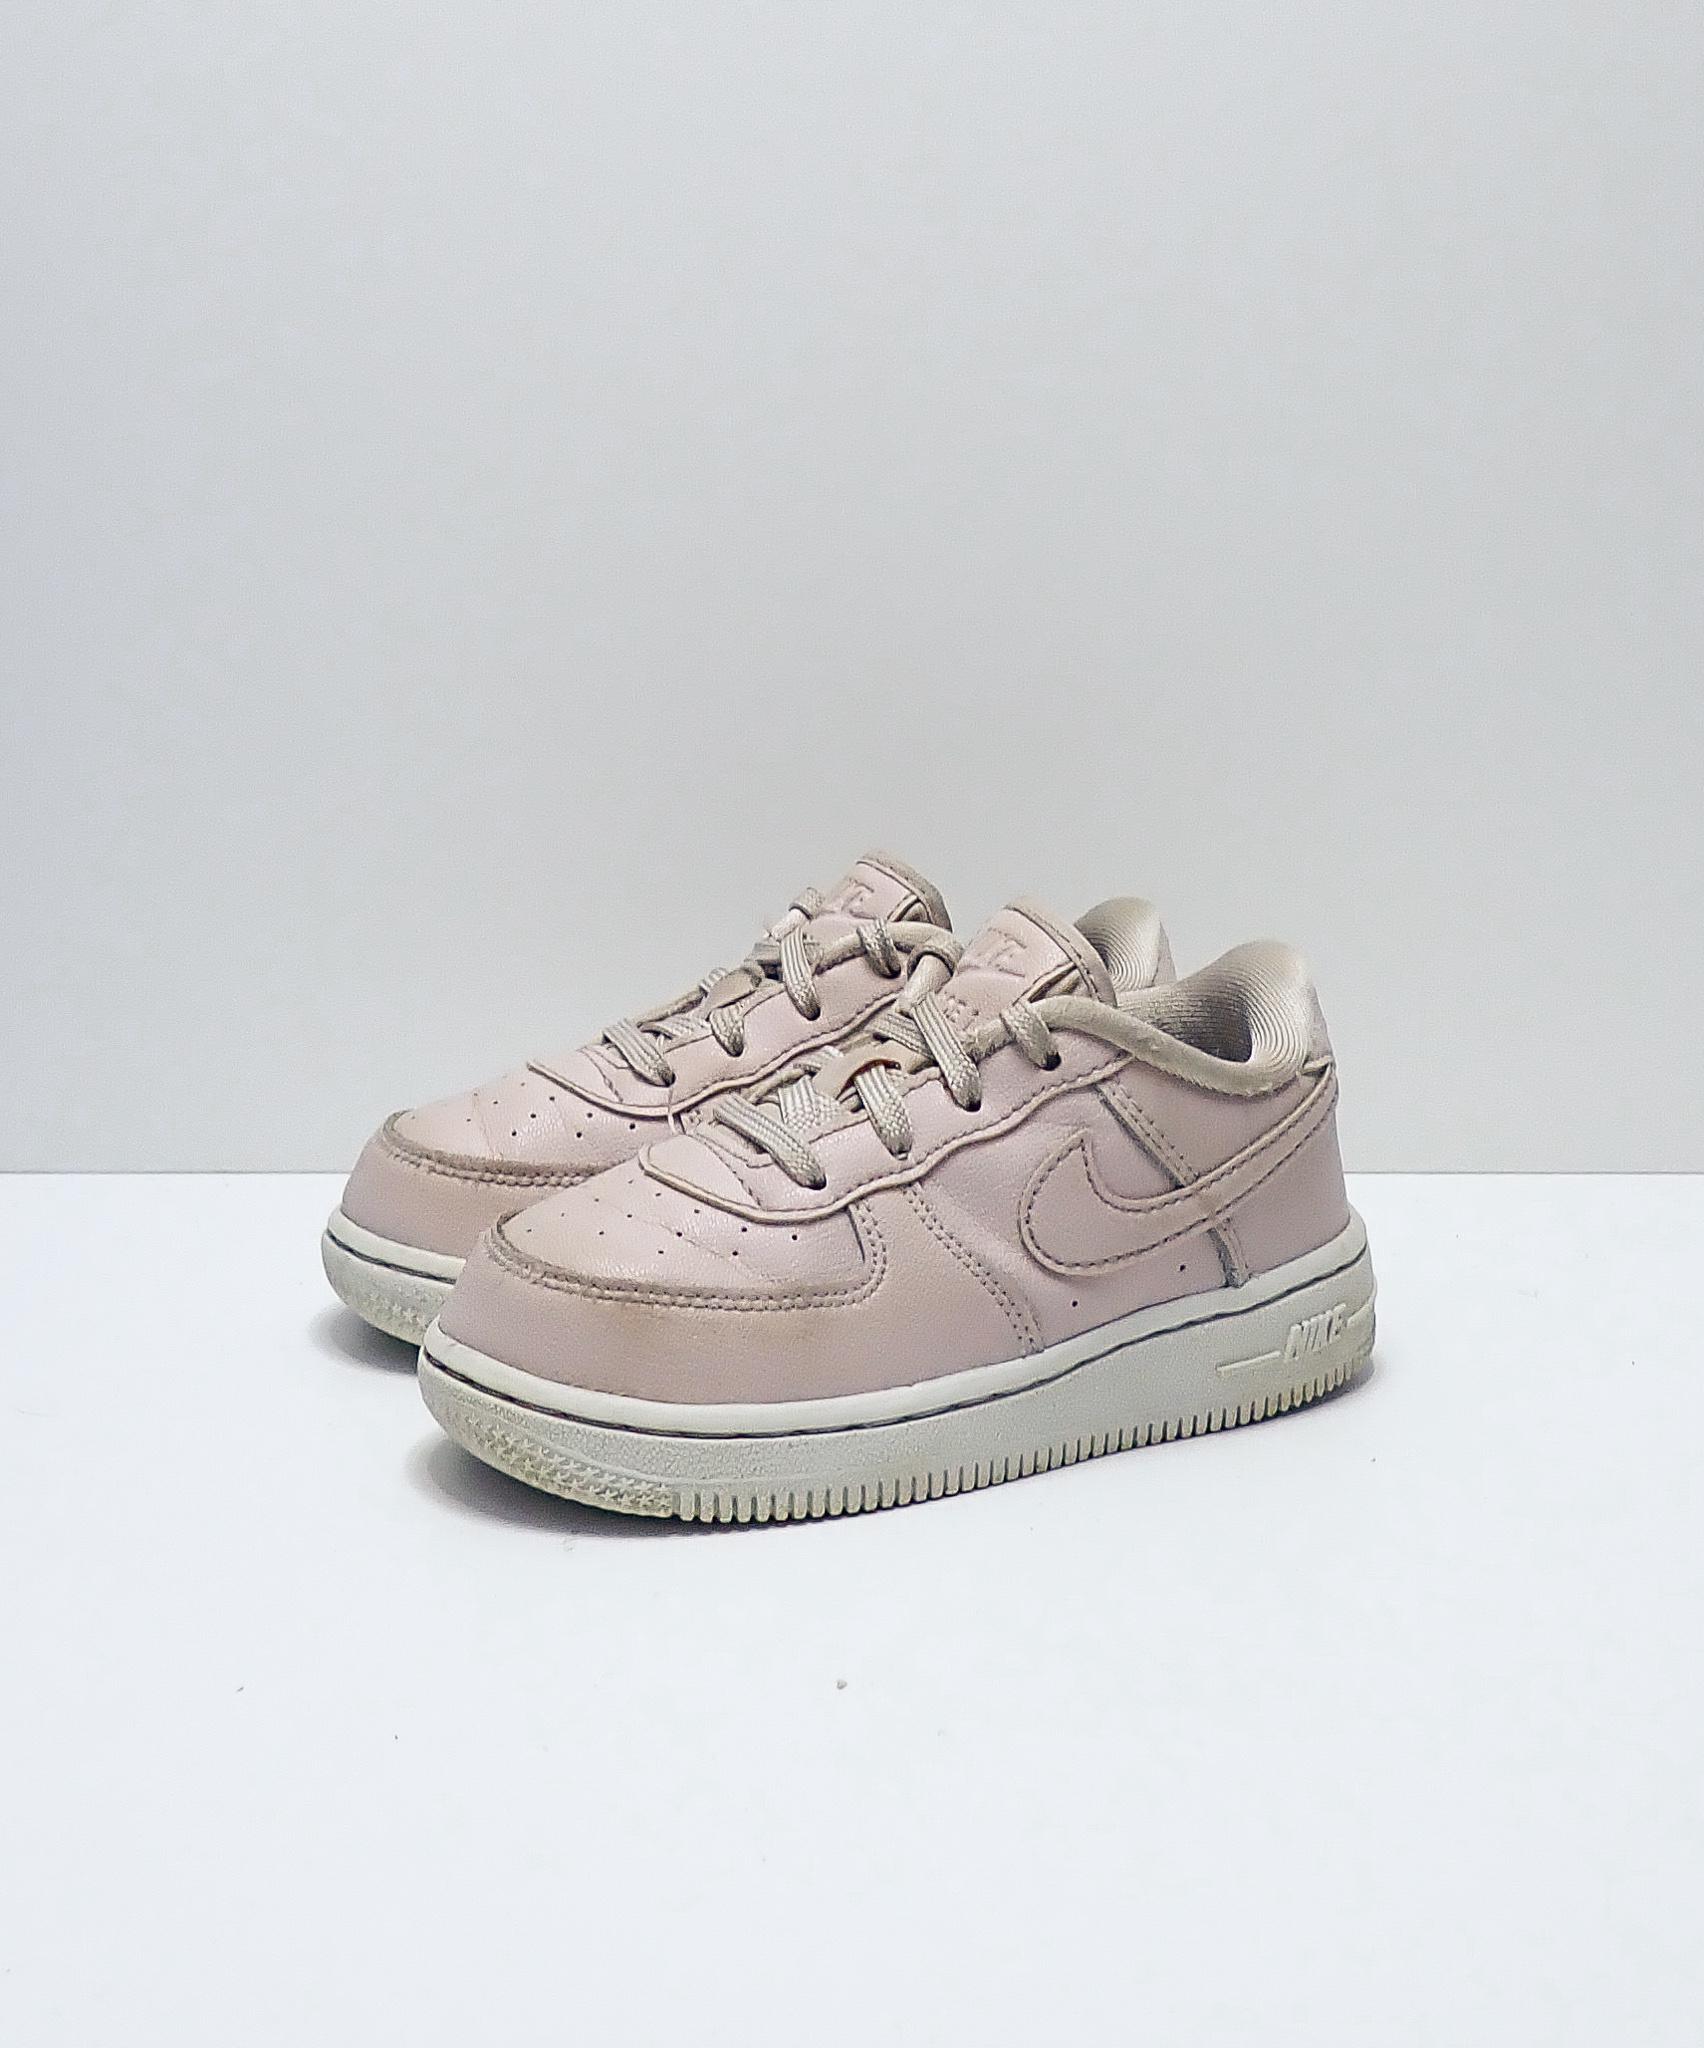 Nike Air Force 1 Low Toddler